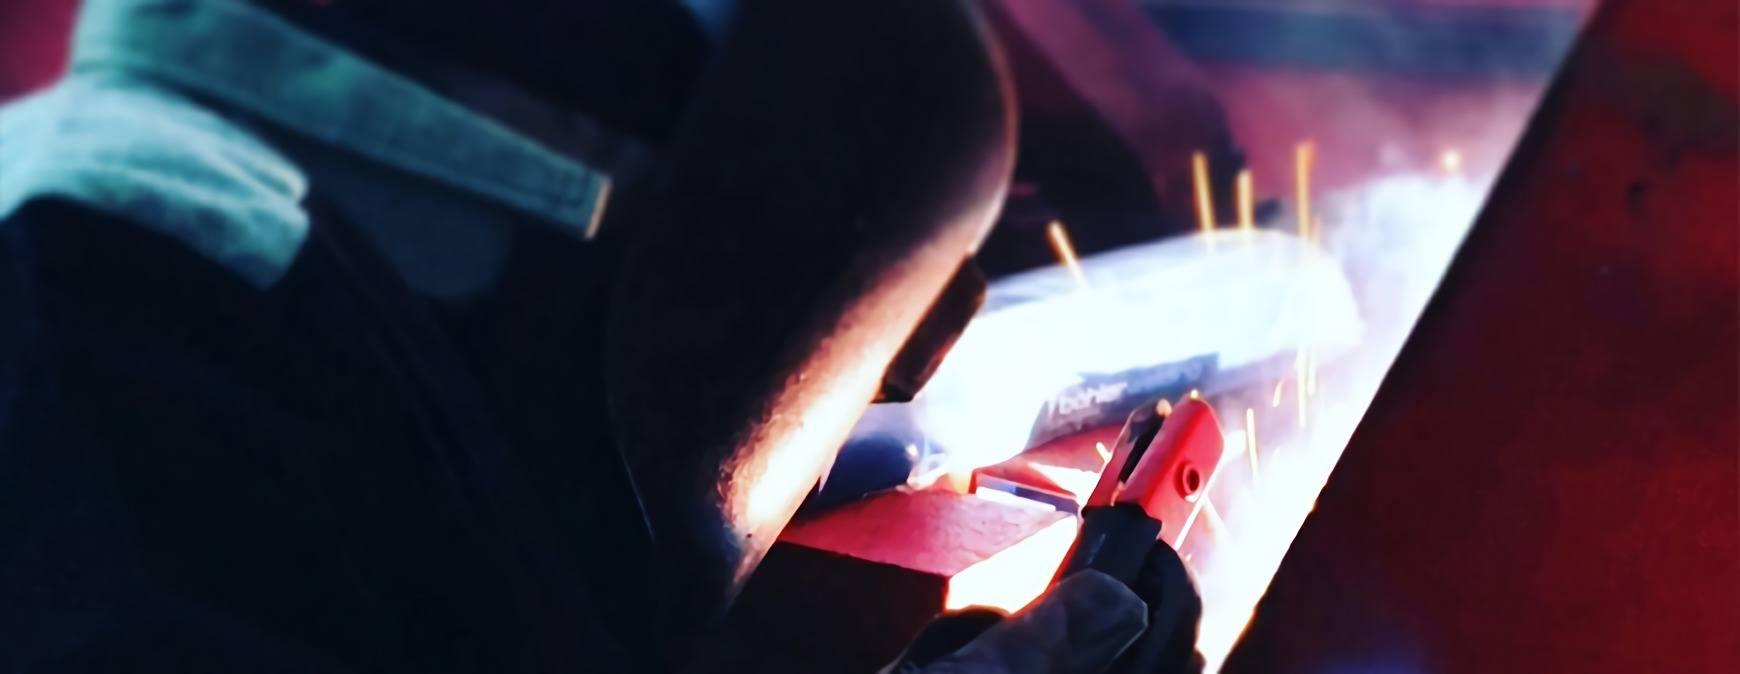 industrial welder using SMAW